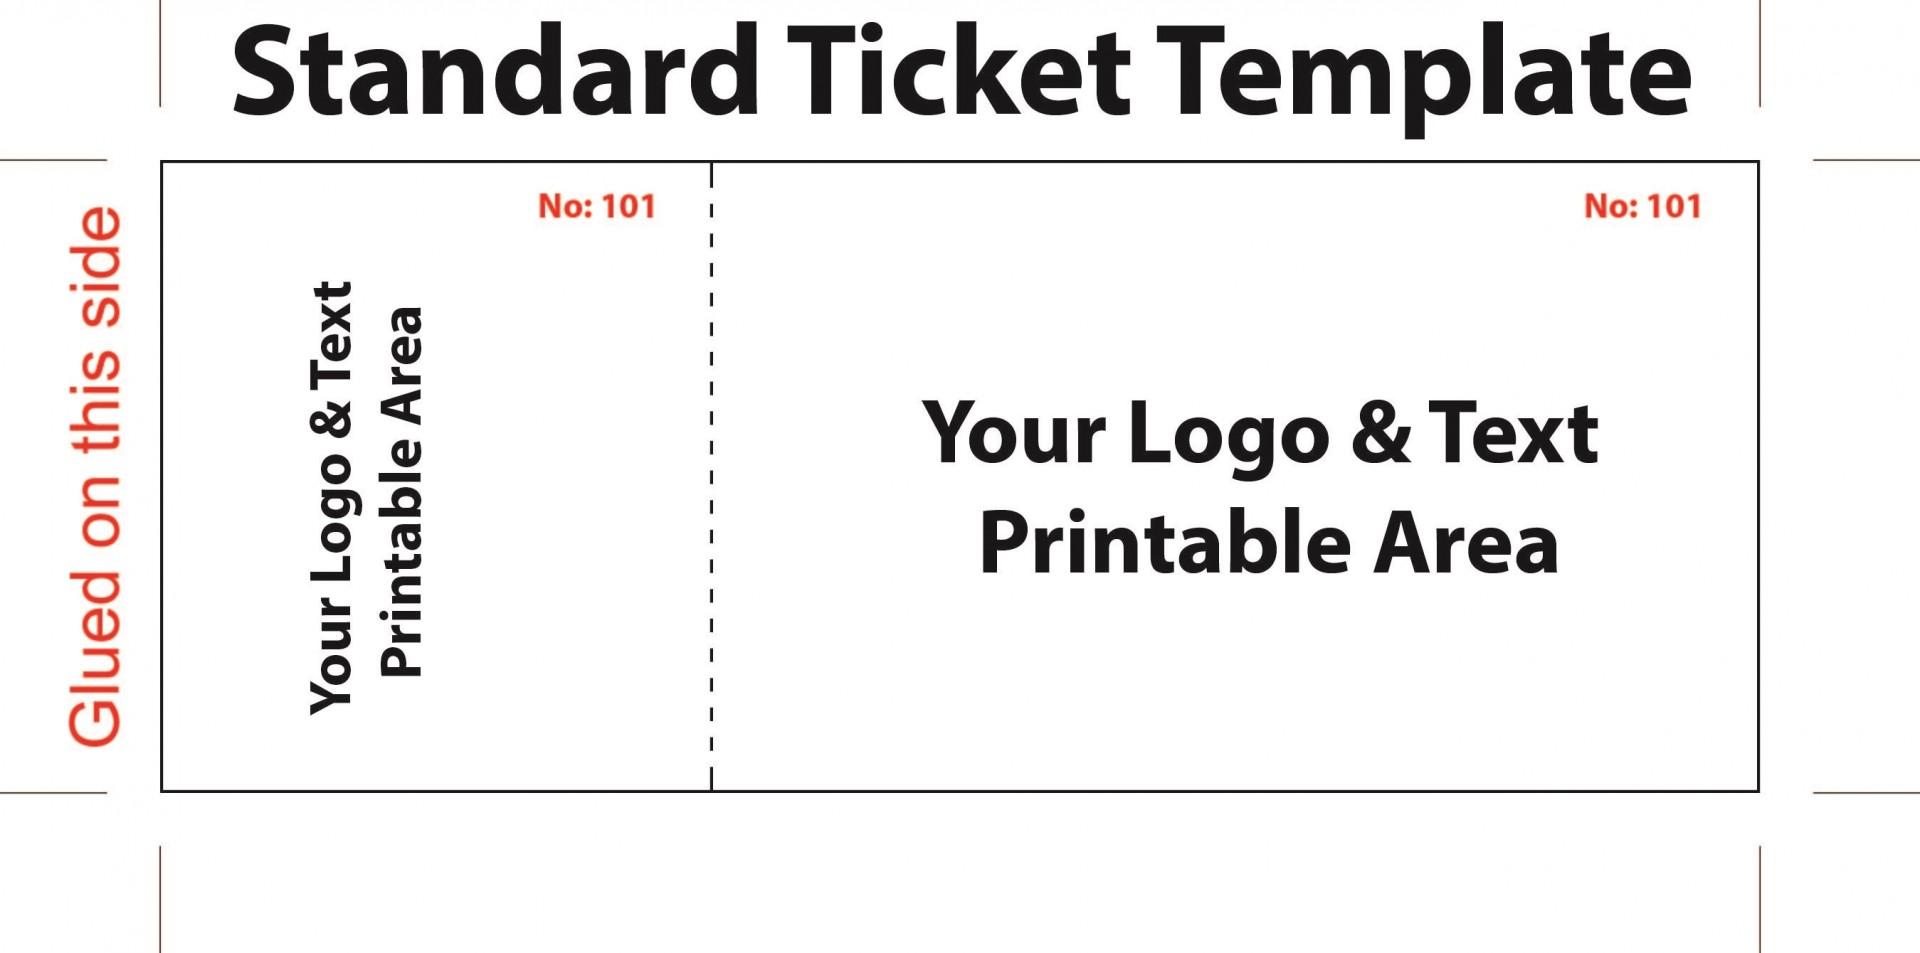 005 Unusual Free Fake Concert Ticket Template Sample 1920